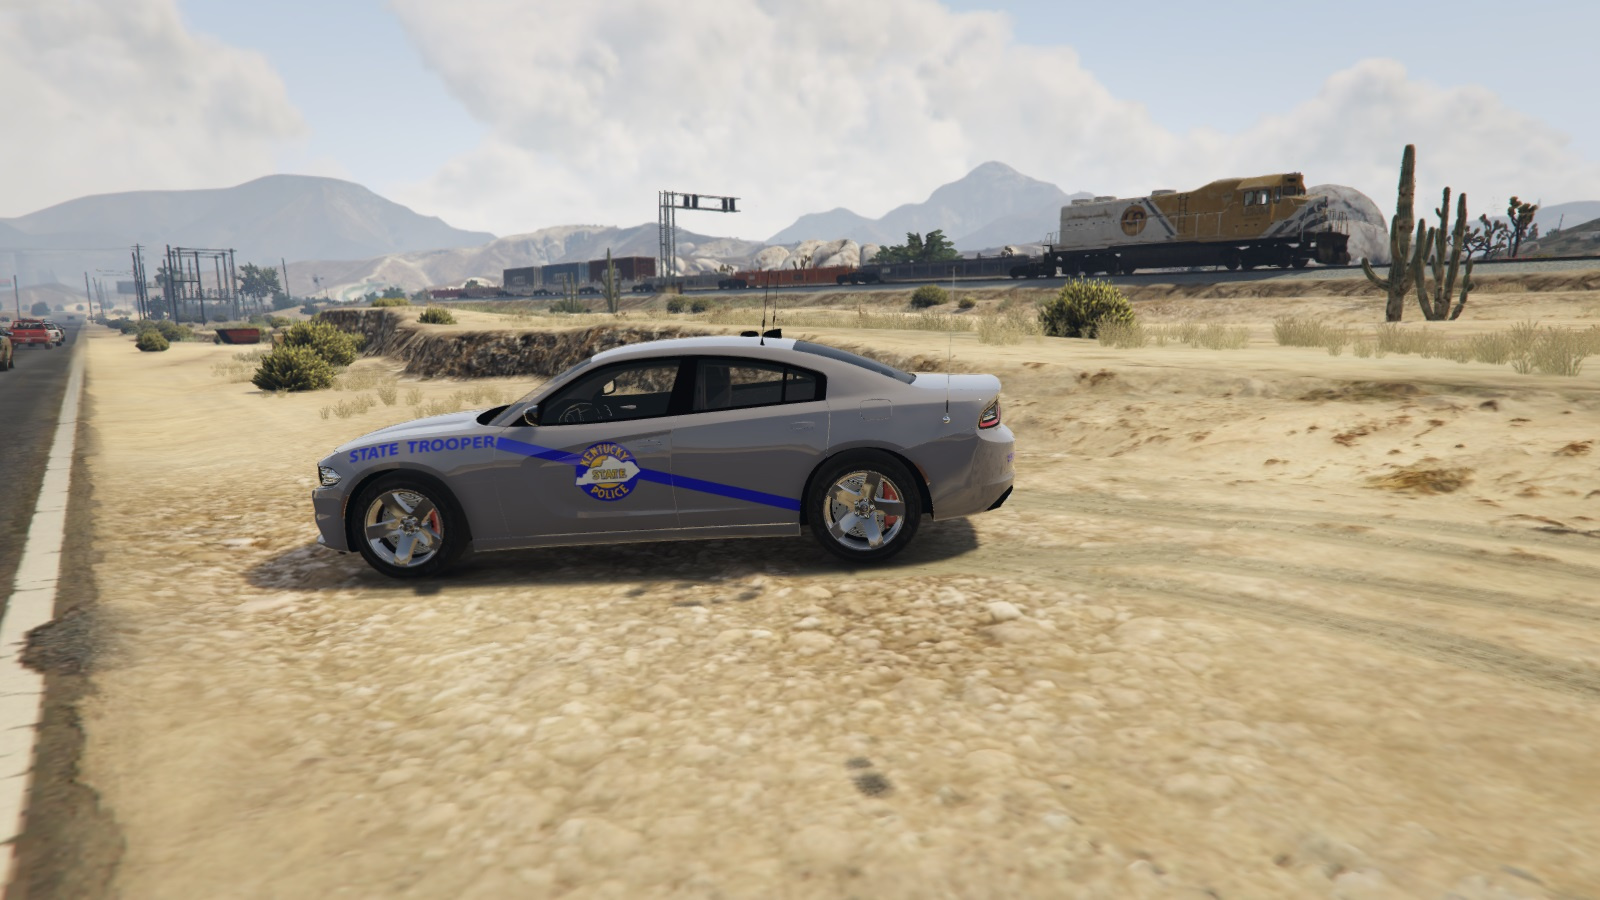 Kentucky State Police 2015 Dodge Charger Skin Gta5 Mods Com